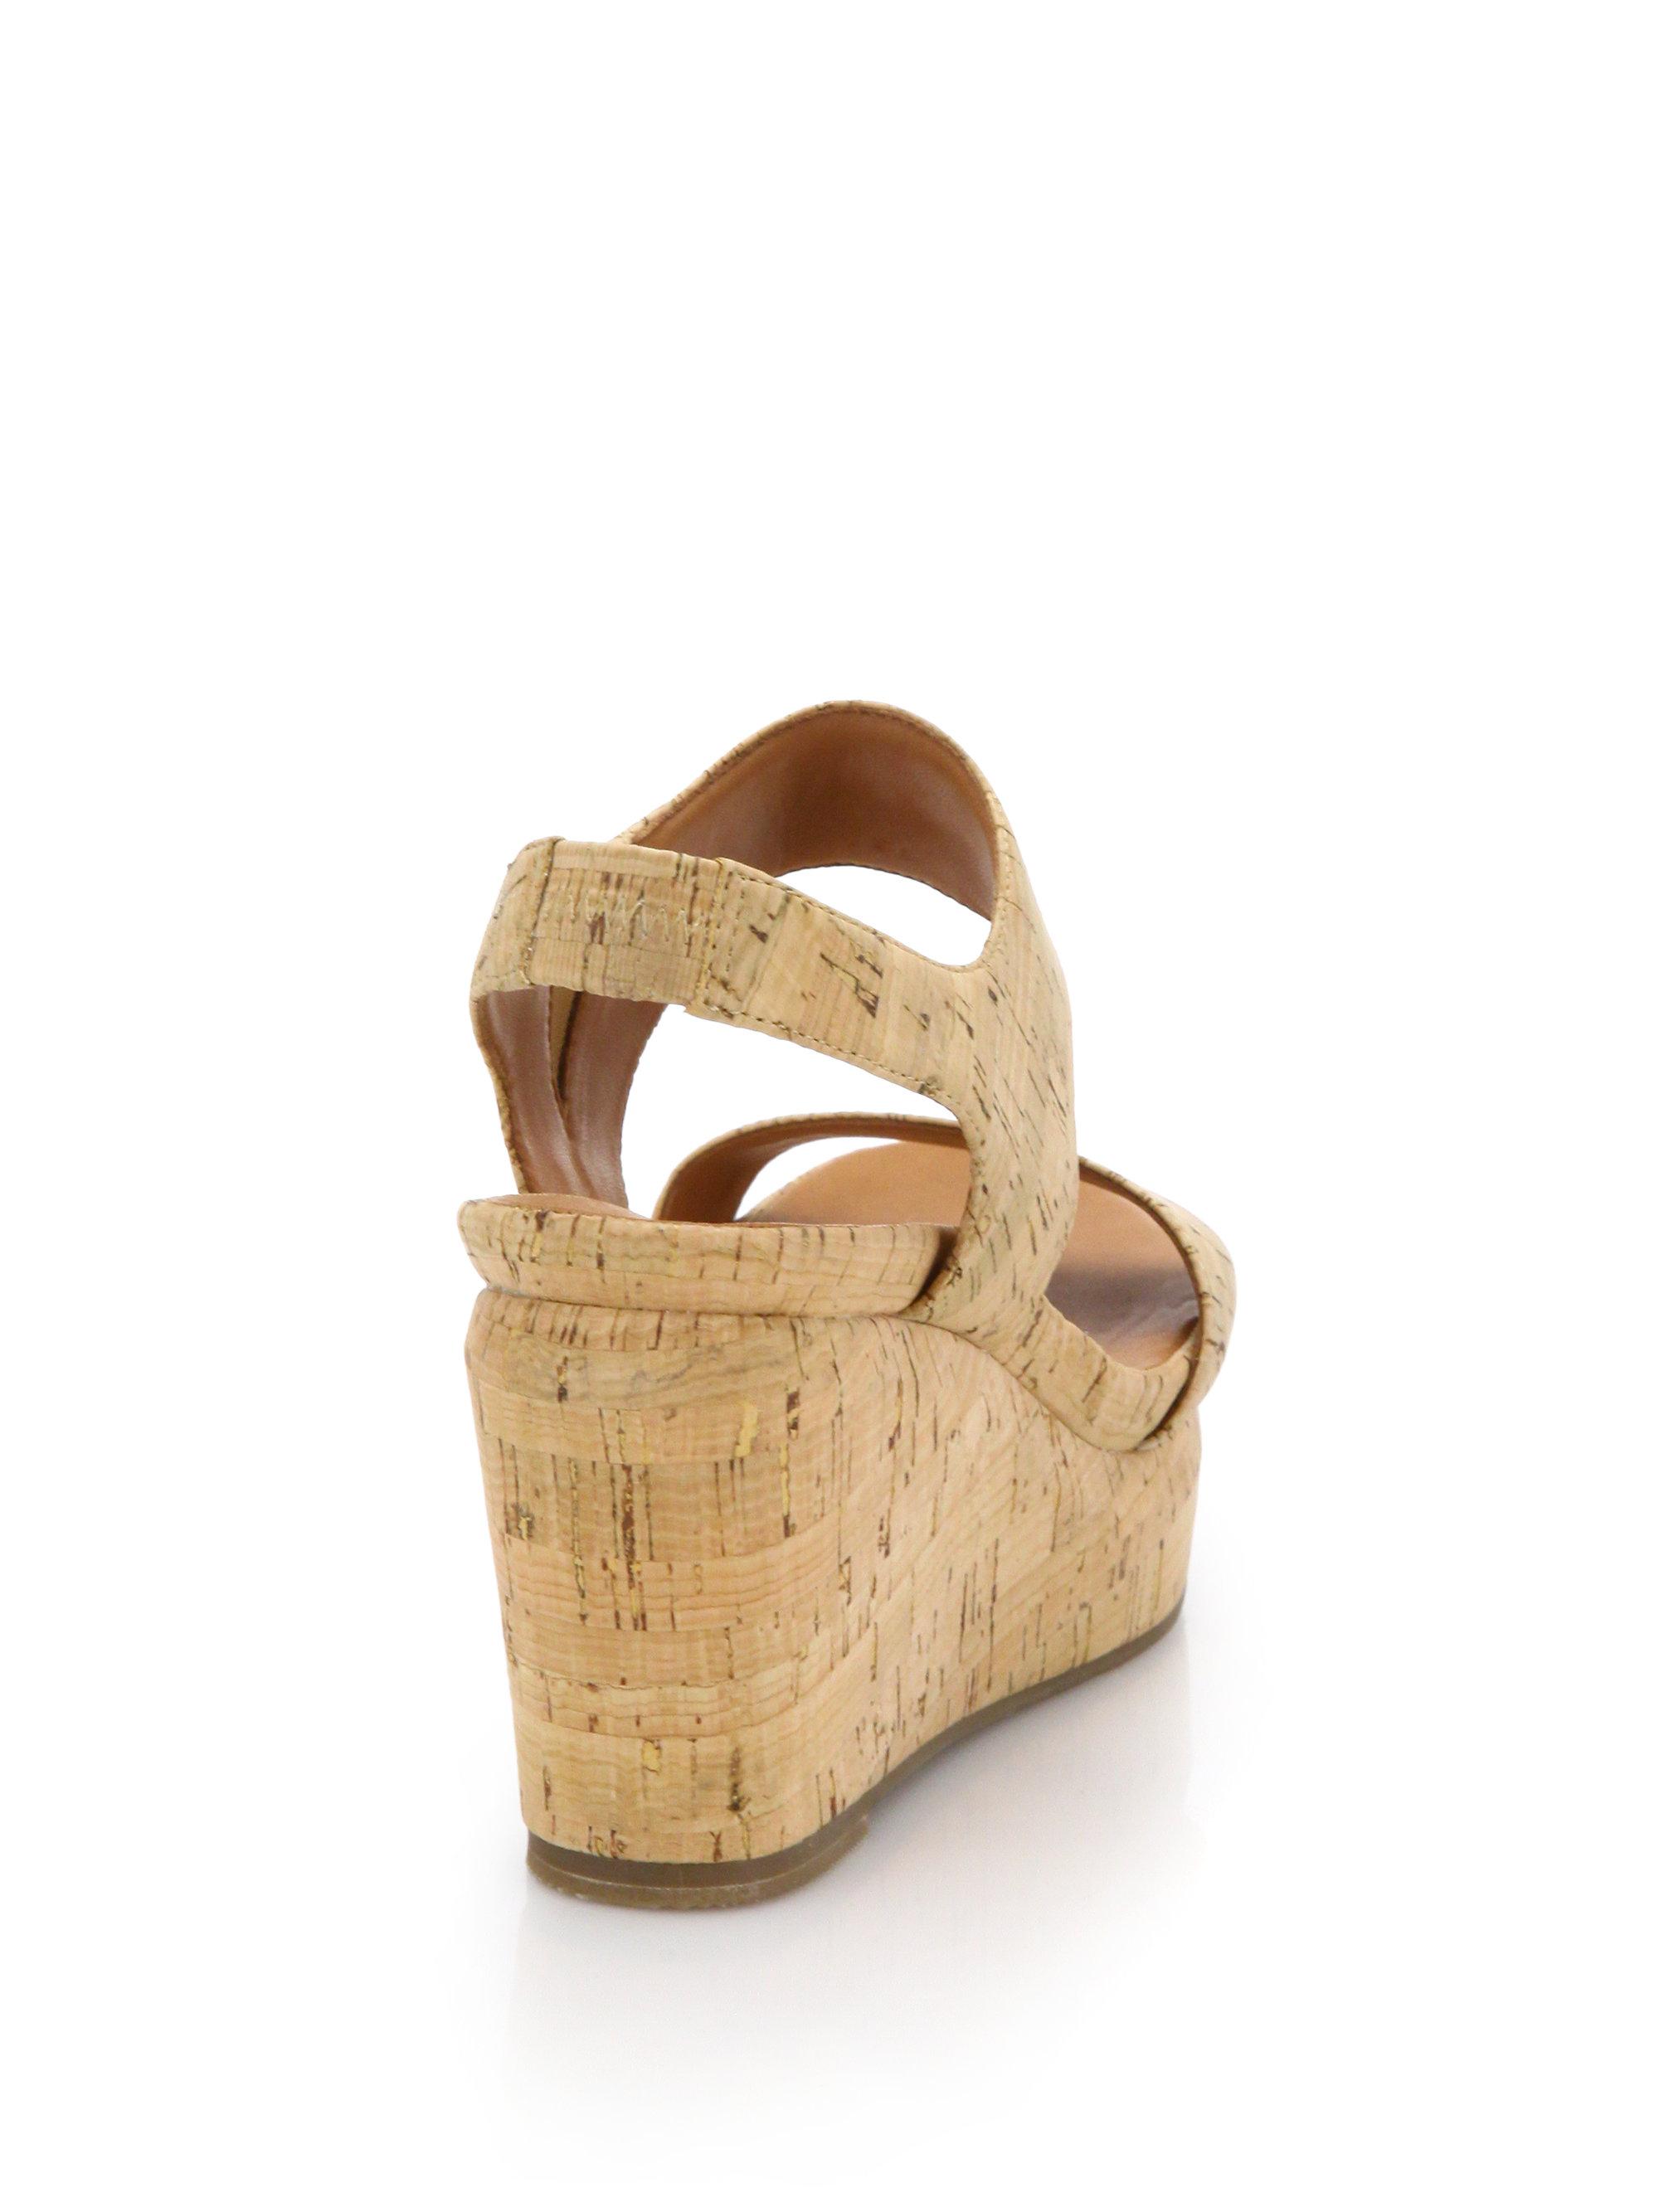 Lyst Gentle Souls Juniper Cork Wedge Sandals In Natural